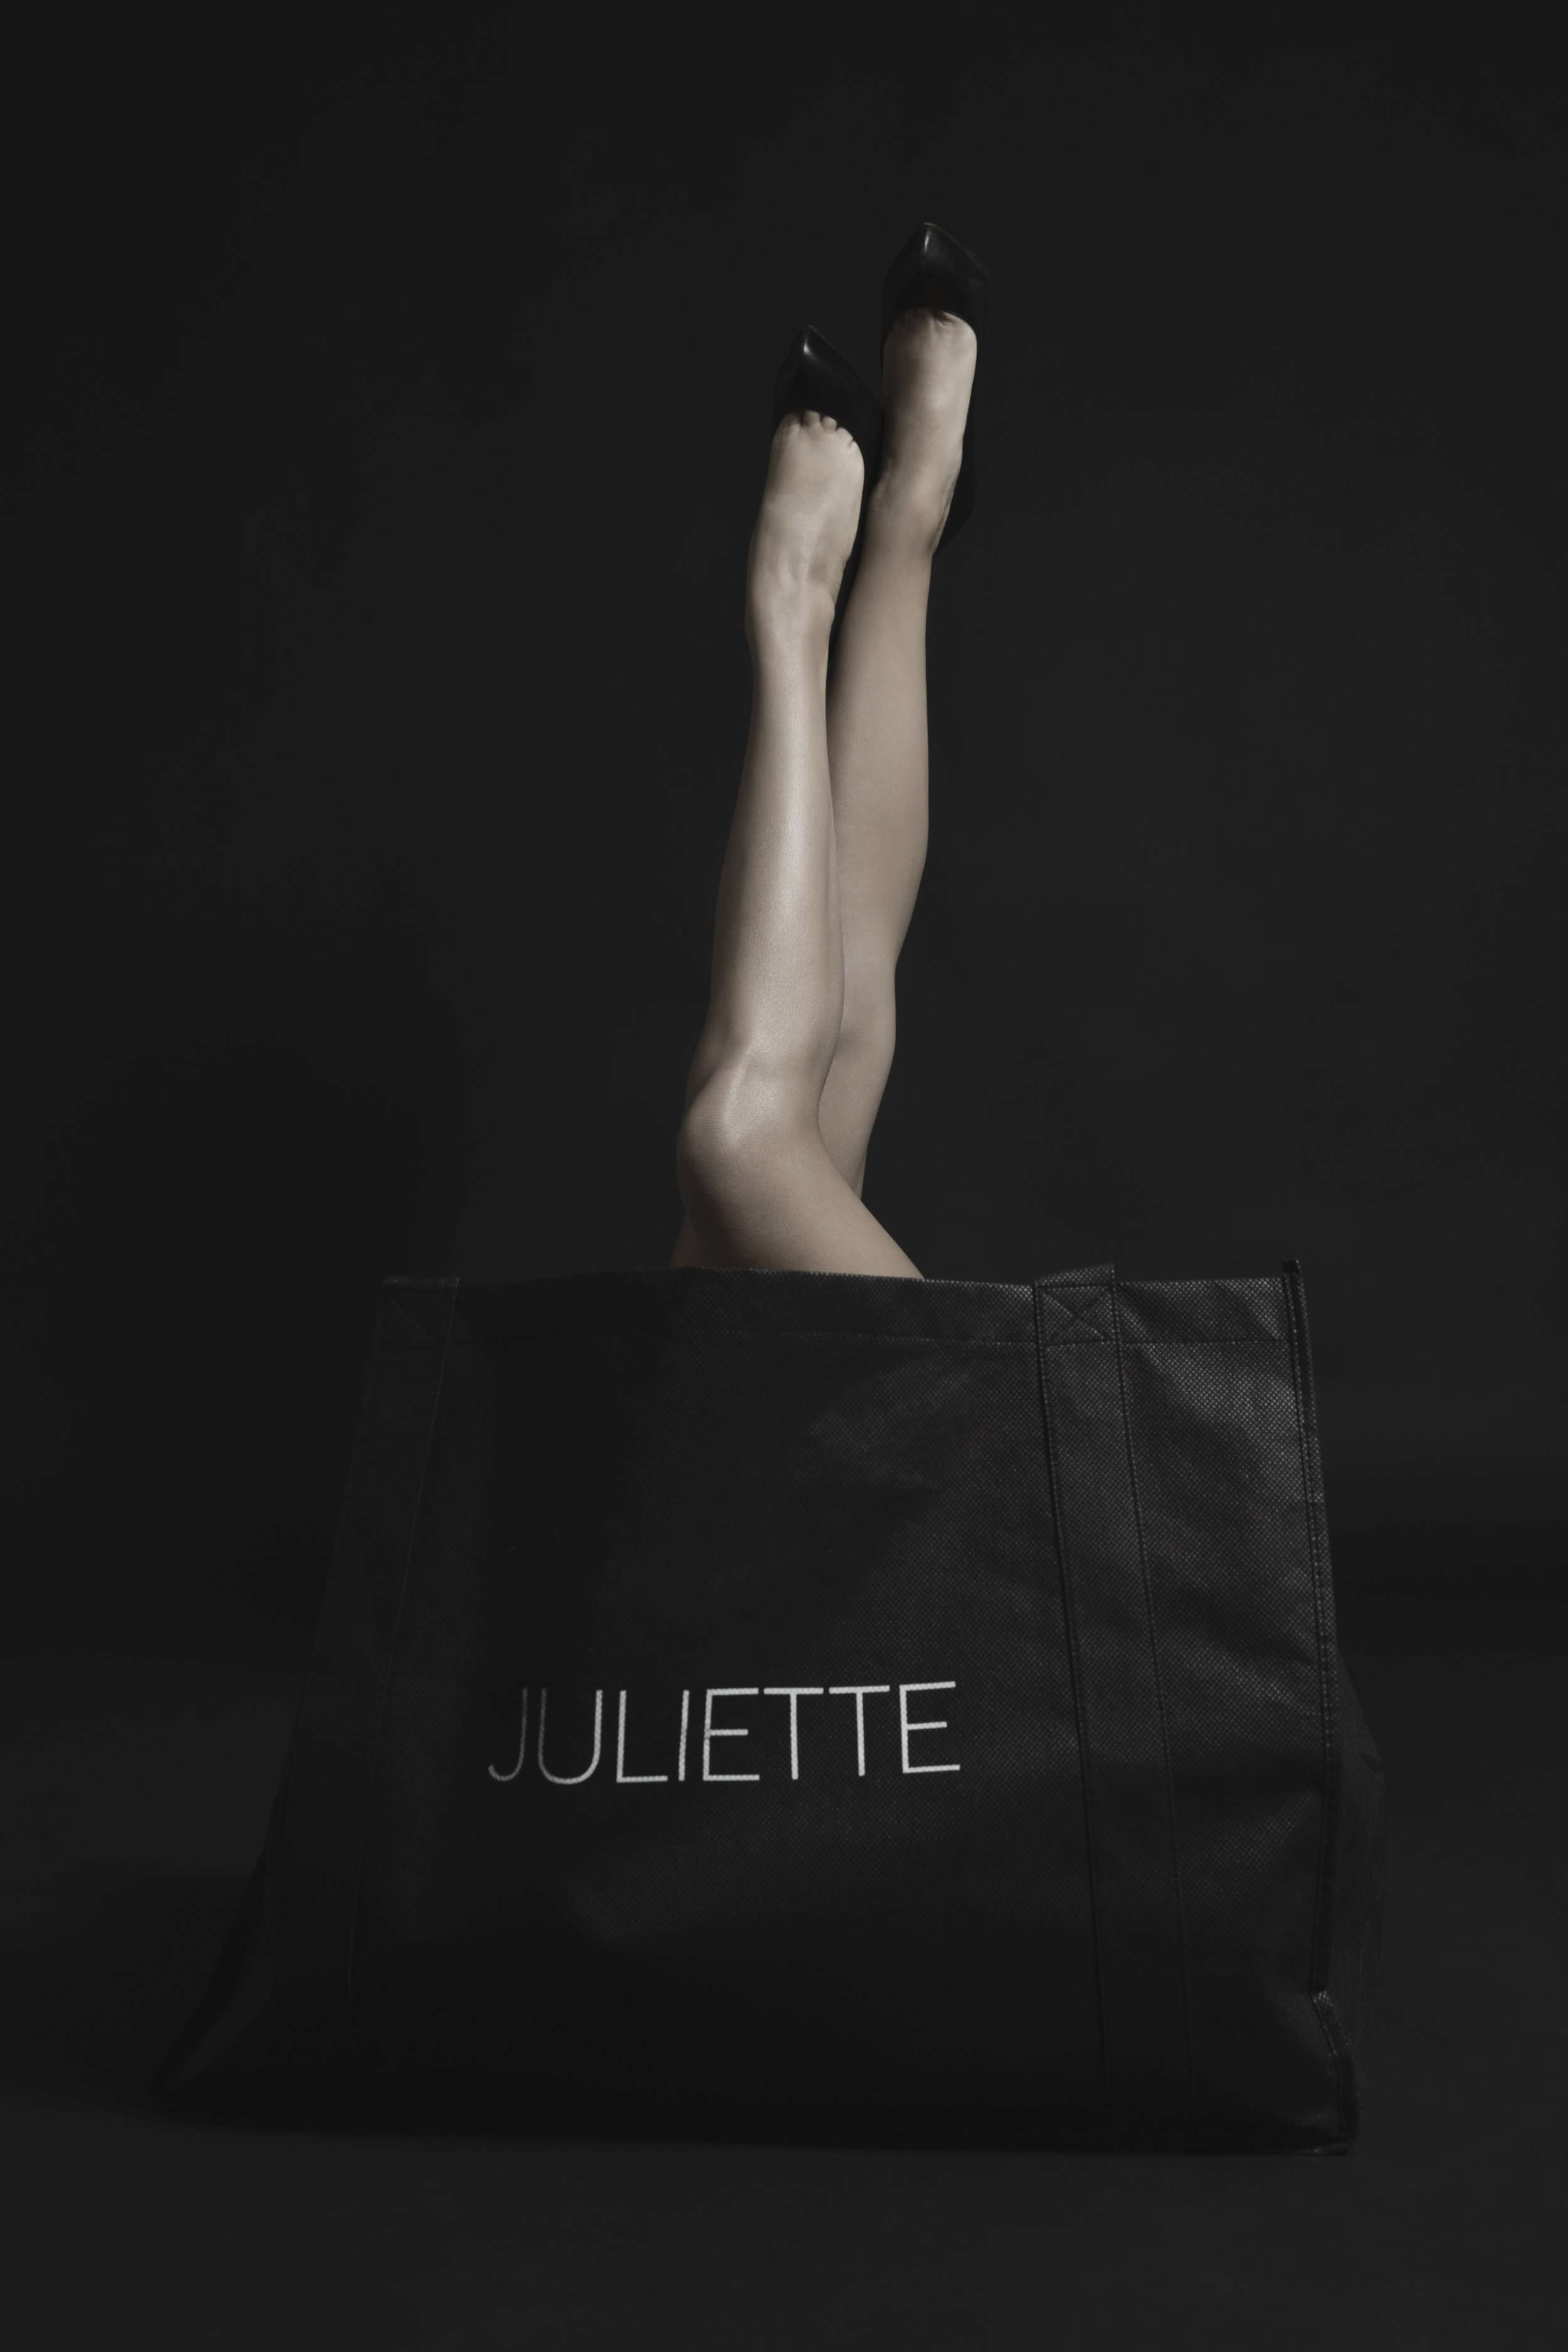 bags - #louisvuitton#celine#hermes#chanel#prada#gucci#fendi#dioR#balenciaga#givenchy#tomford